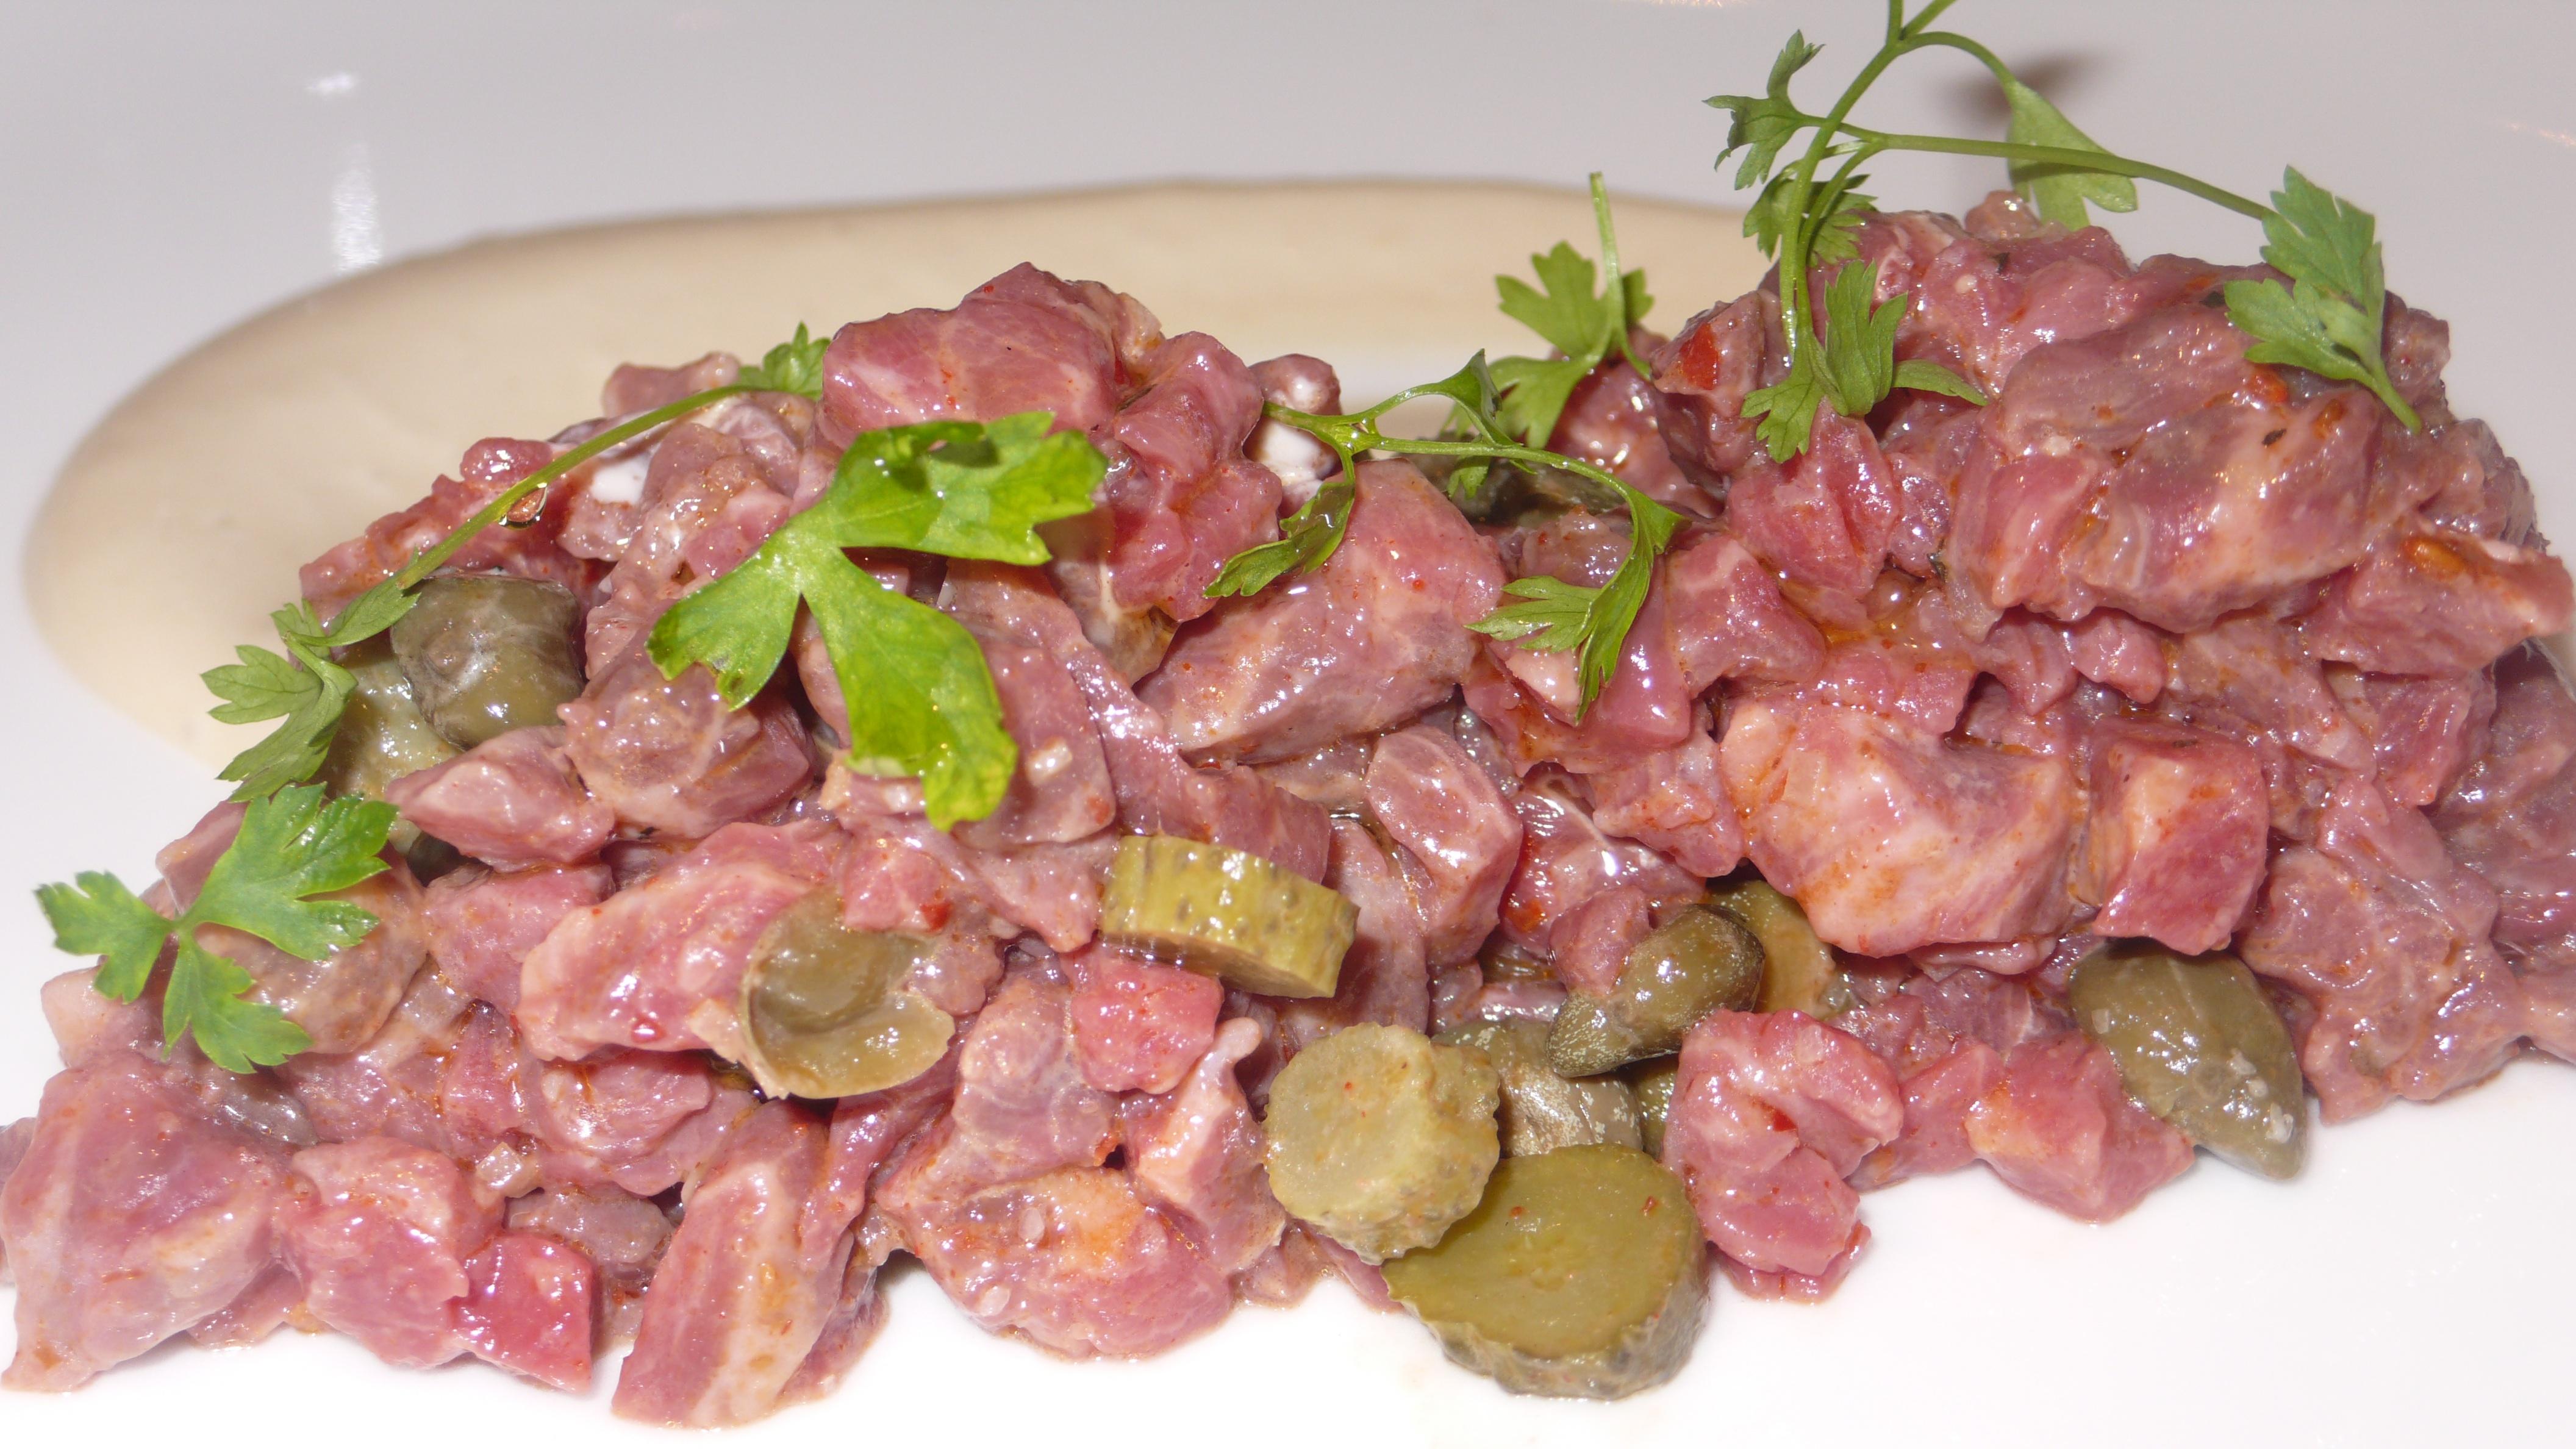 ... steak tartare capital grille french steak tartare steak tartare recipe